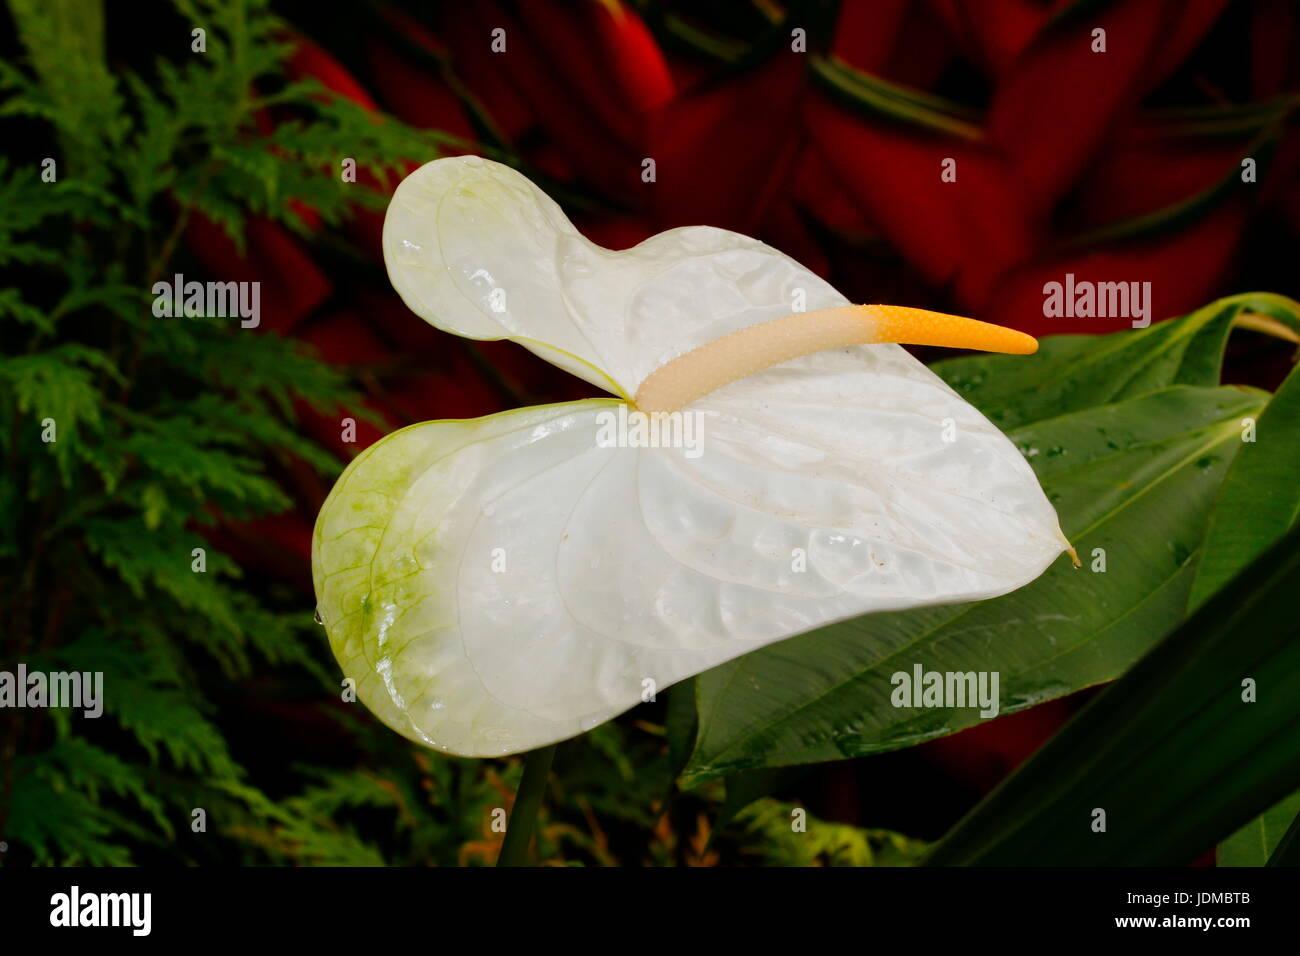 A White Anthurium Flower Growing At A Botanical Garden Stock Photo